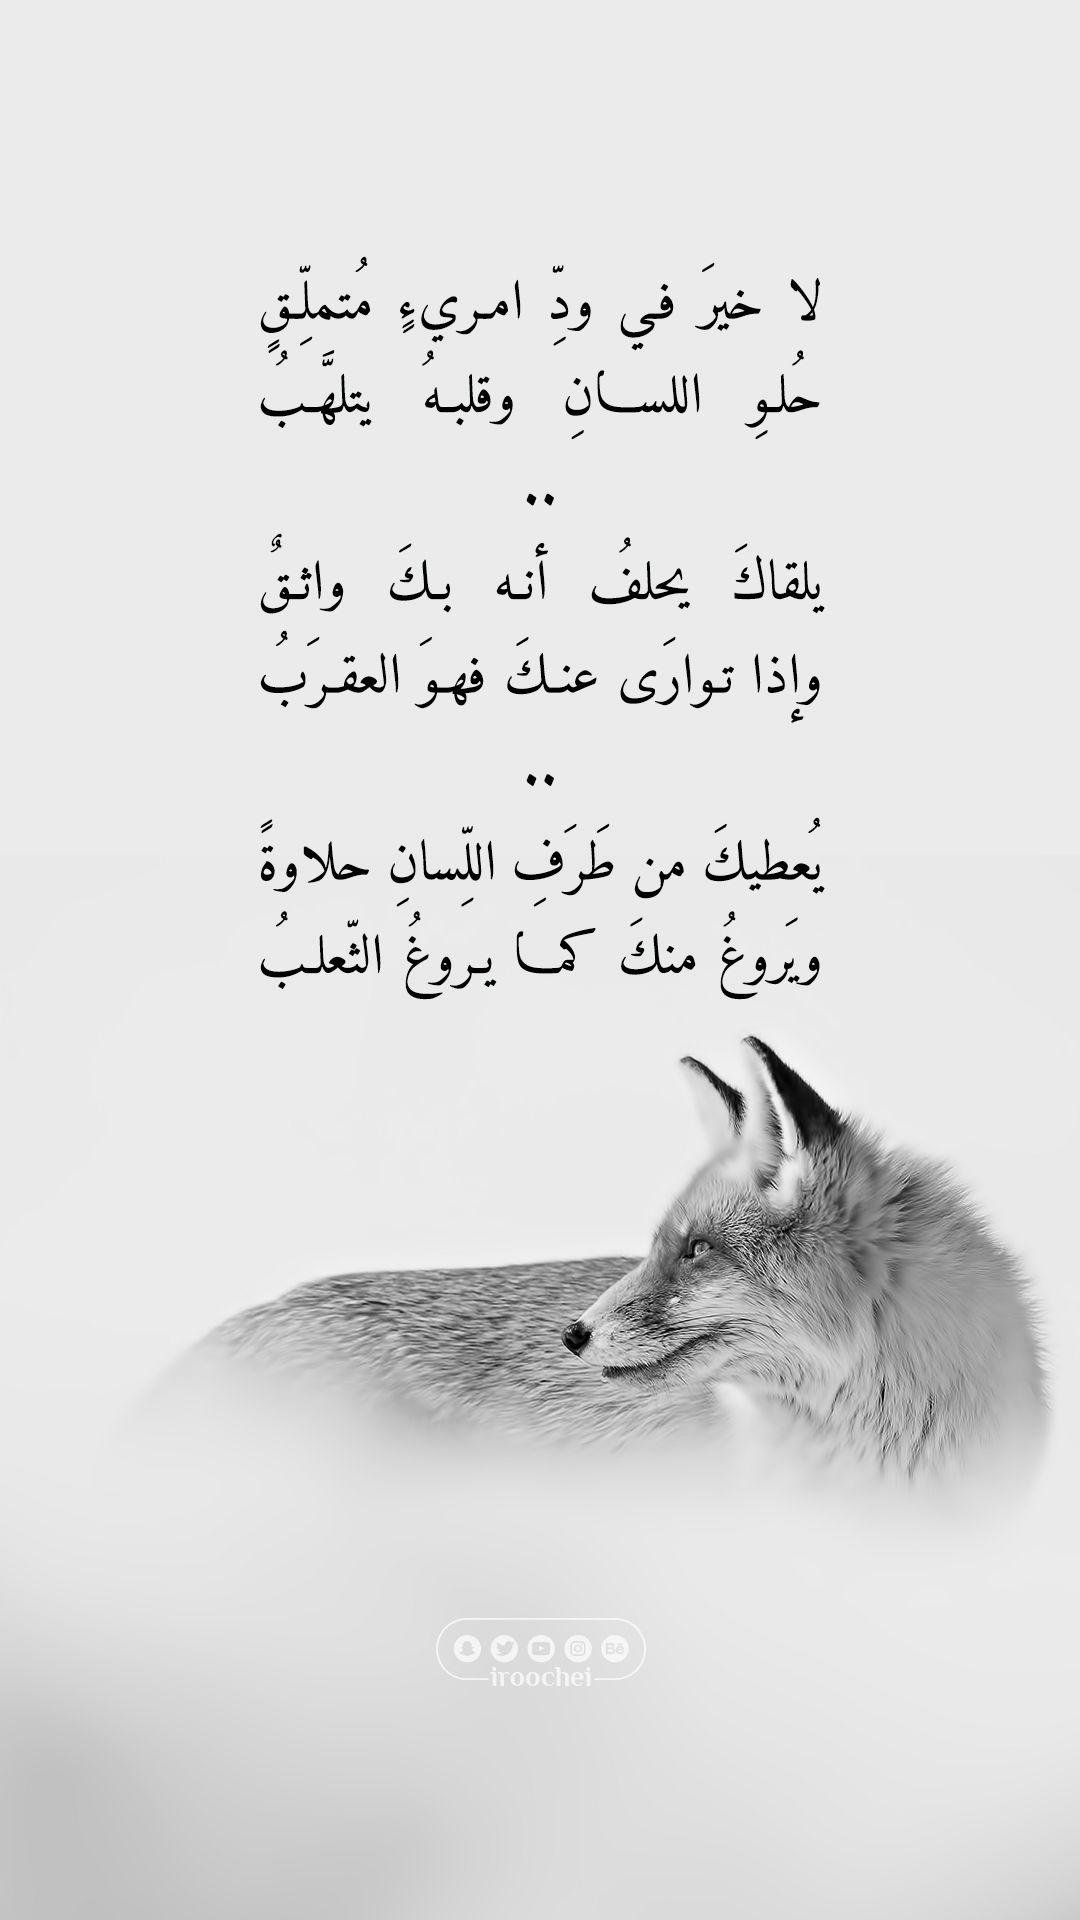 يعطيك من طرف اللسان حلاوة Wisdom Quotes Life Quotes For Book Lovers Words Quotes